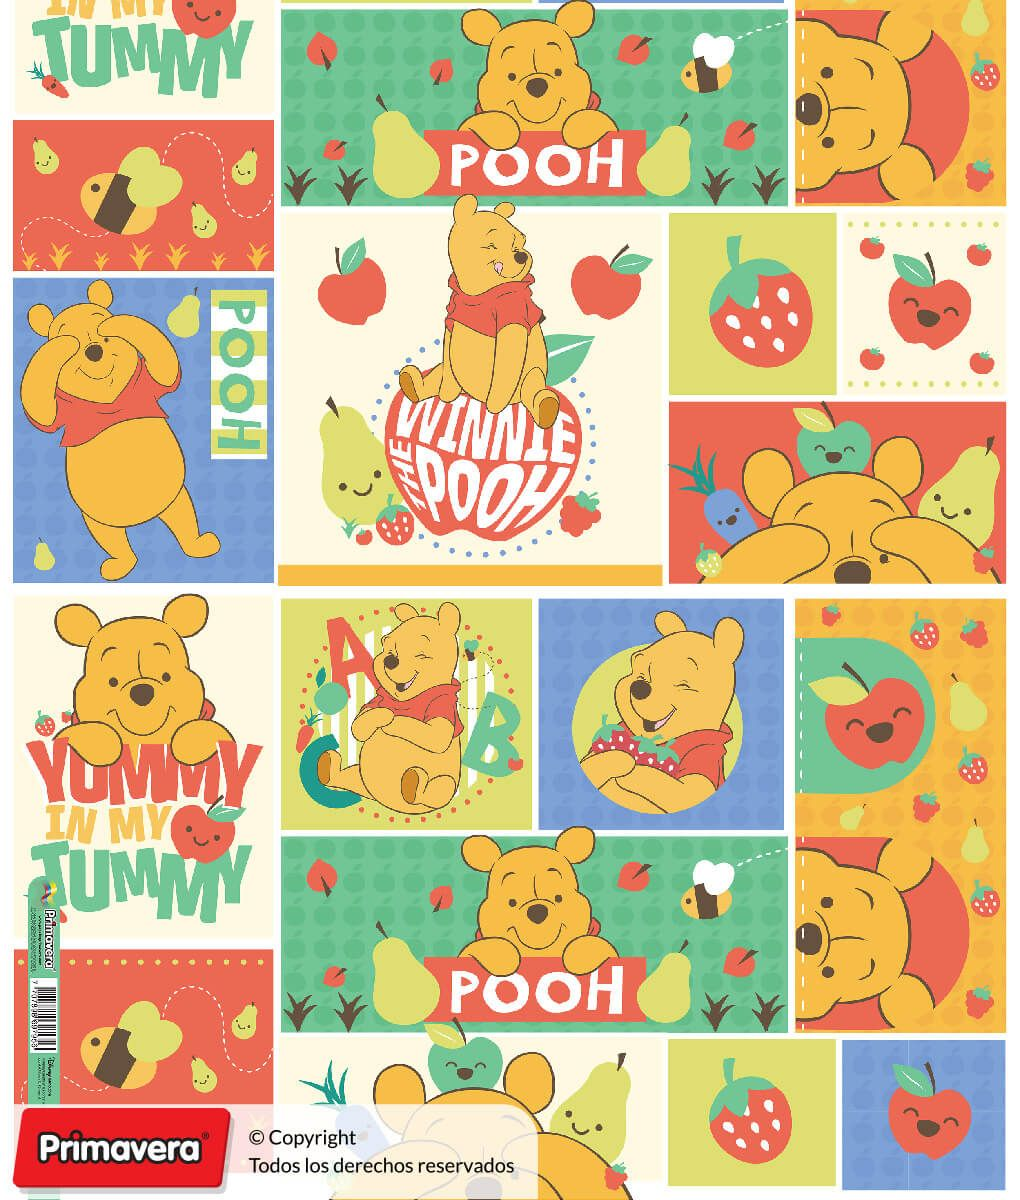 Papel De Regalo Premium Winnie Pooh Papeles Primavera